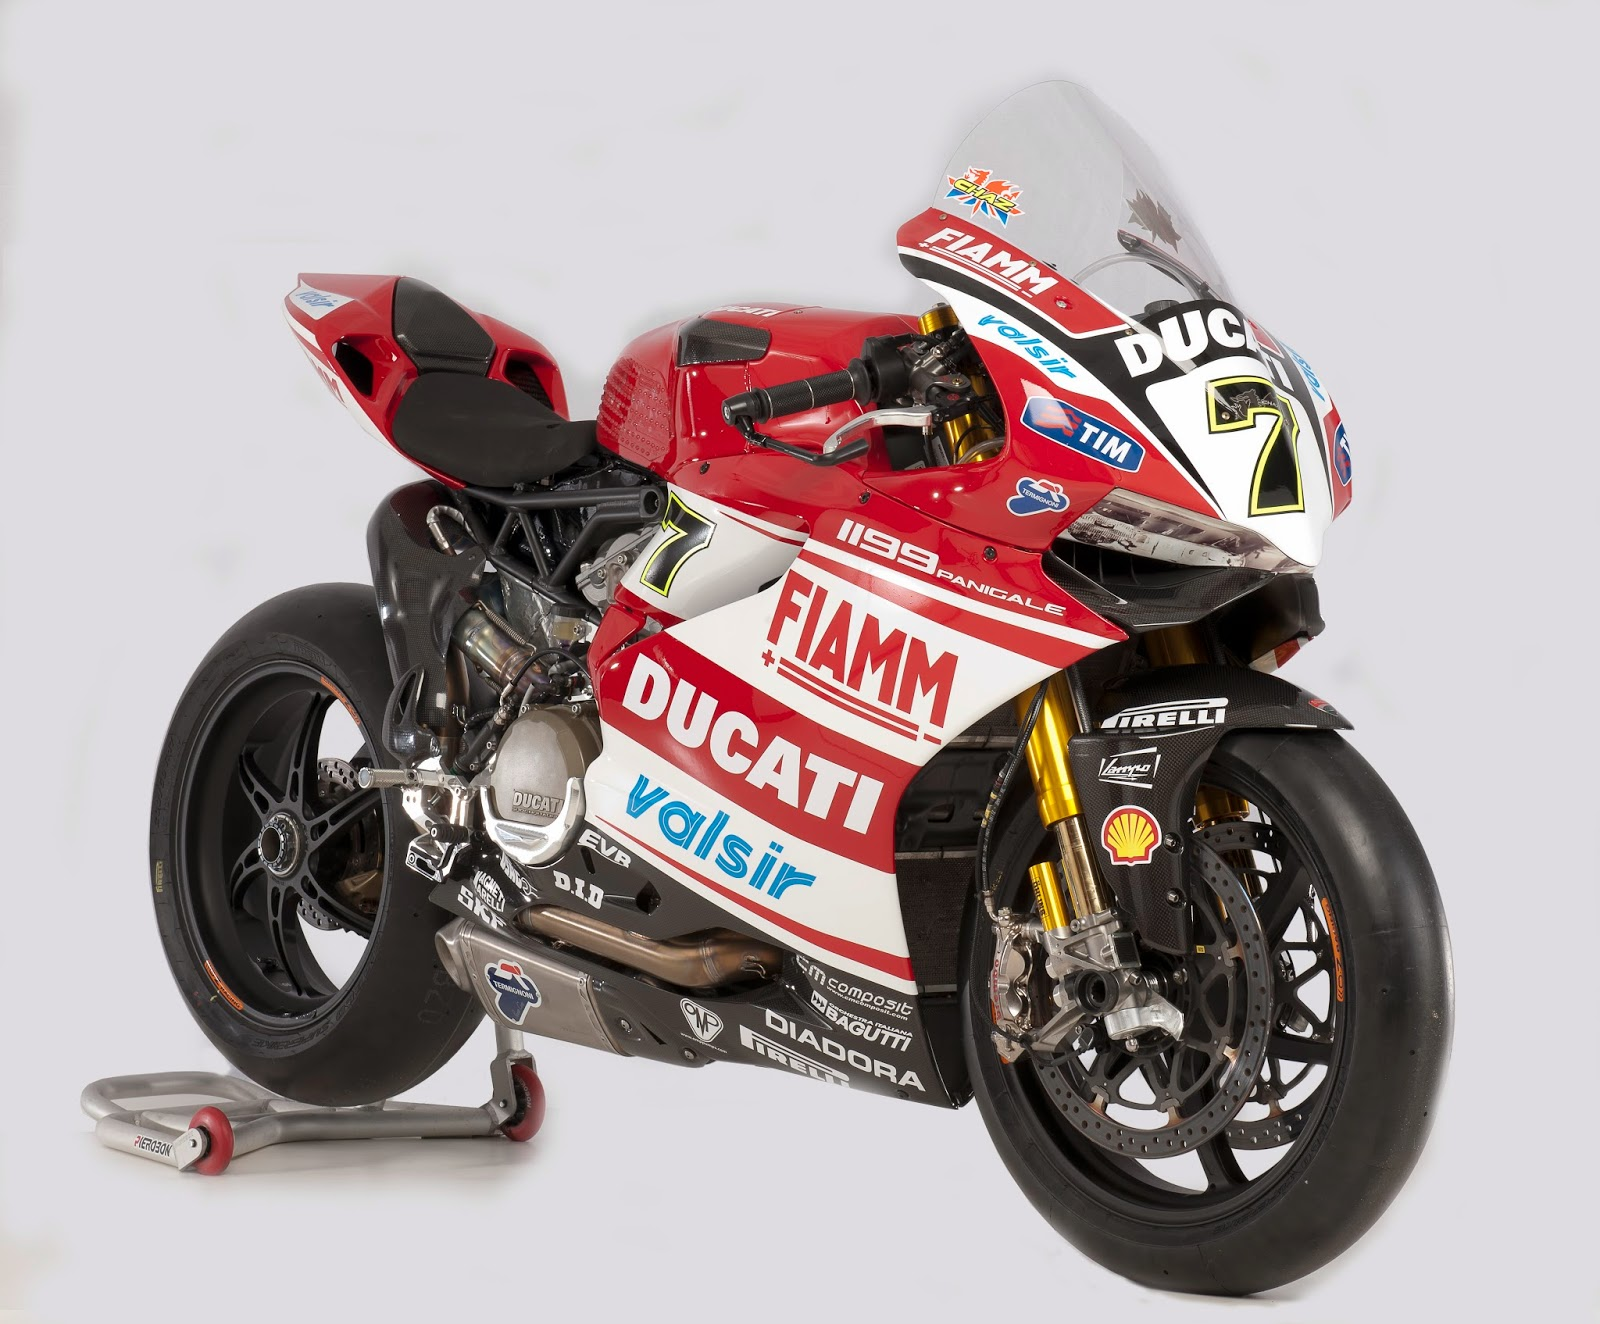 Racing Caf 232 Ducati 1199 Panigale Ducati Superbike Team 2014